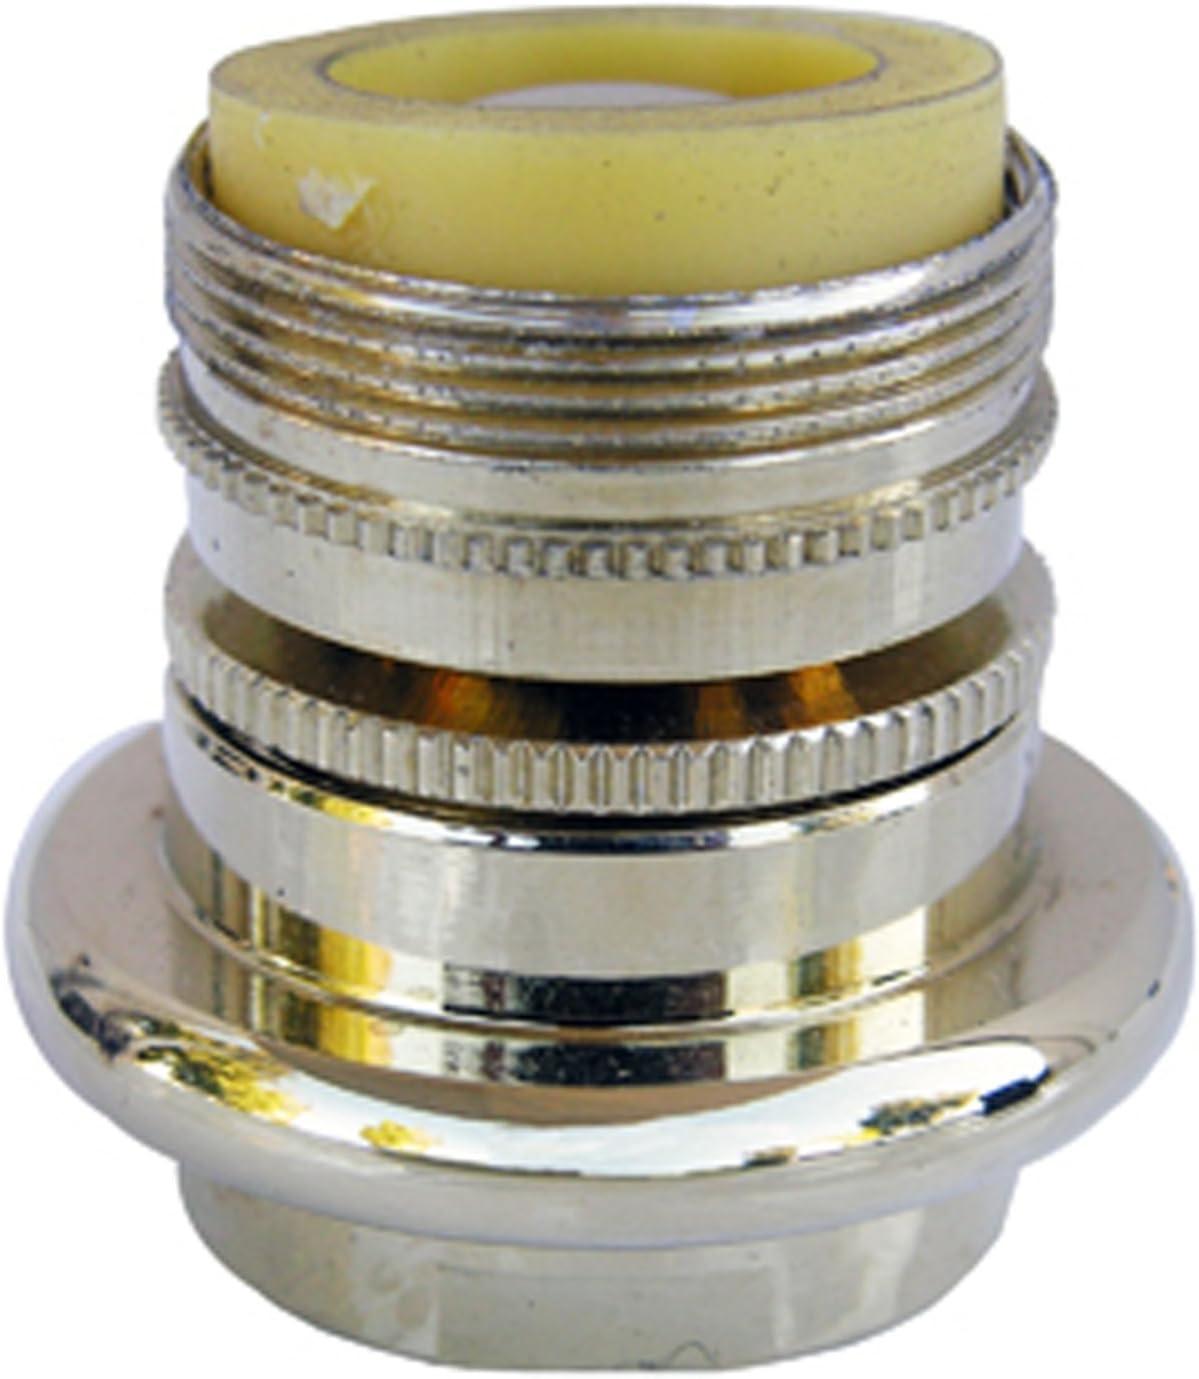 Simpatico 91091P Brass Swivel Aerator Standard Female Thread Wit